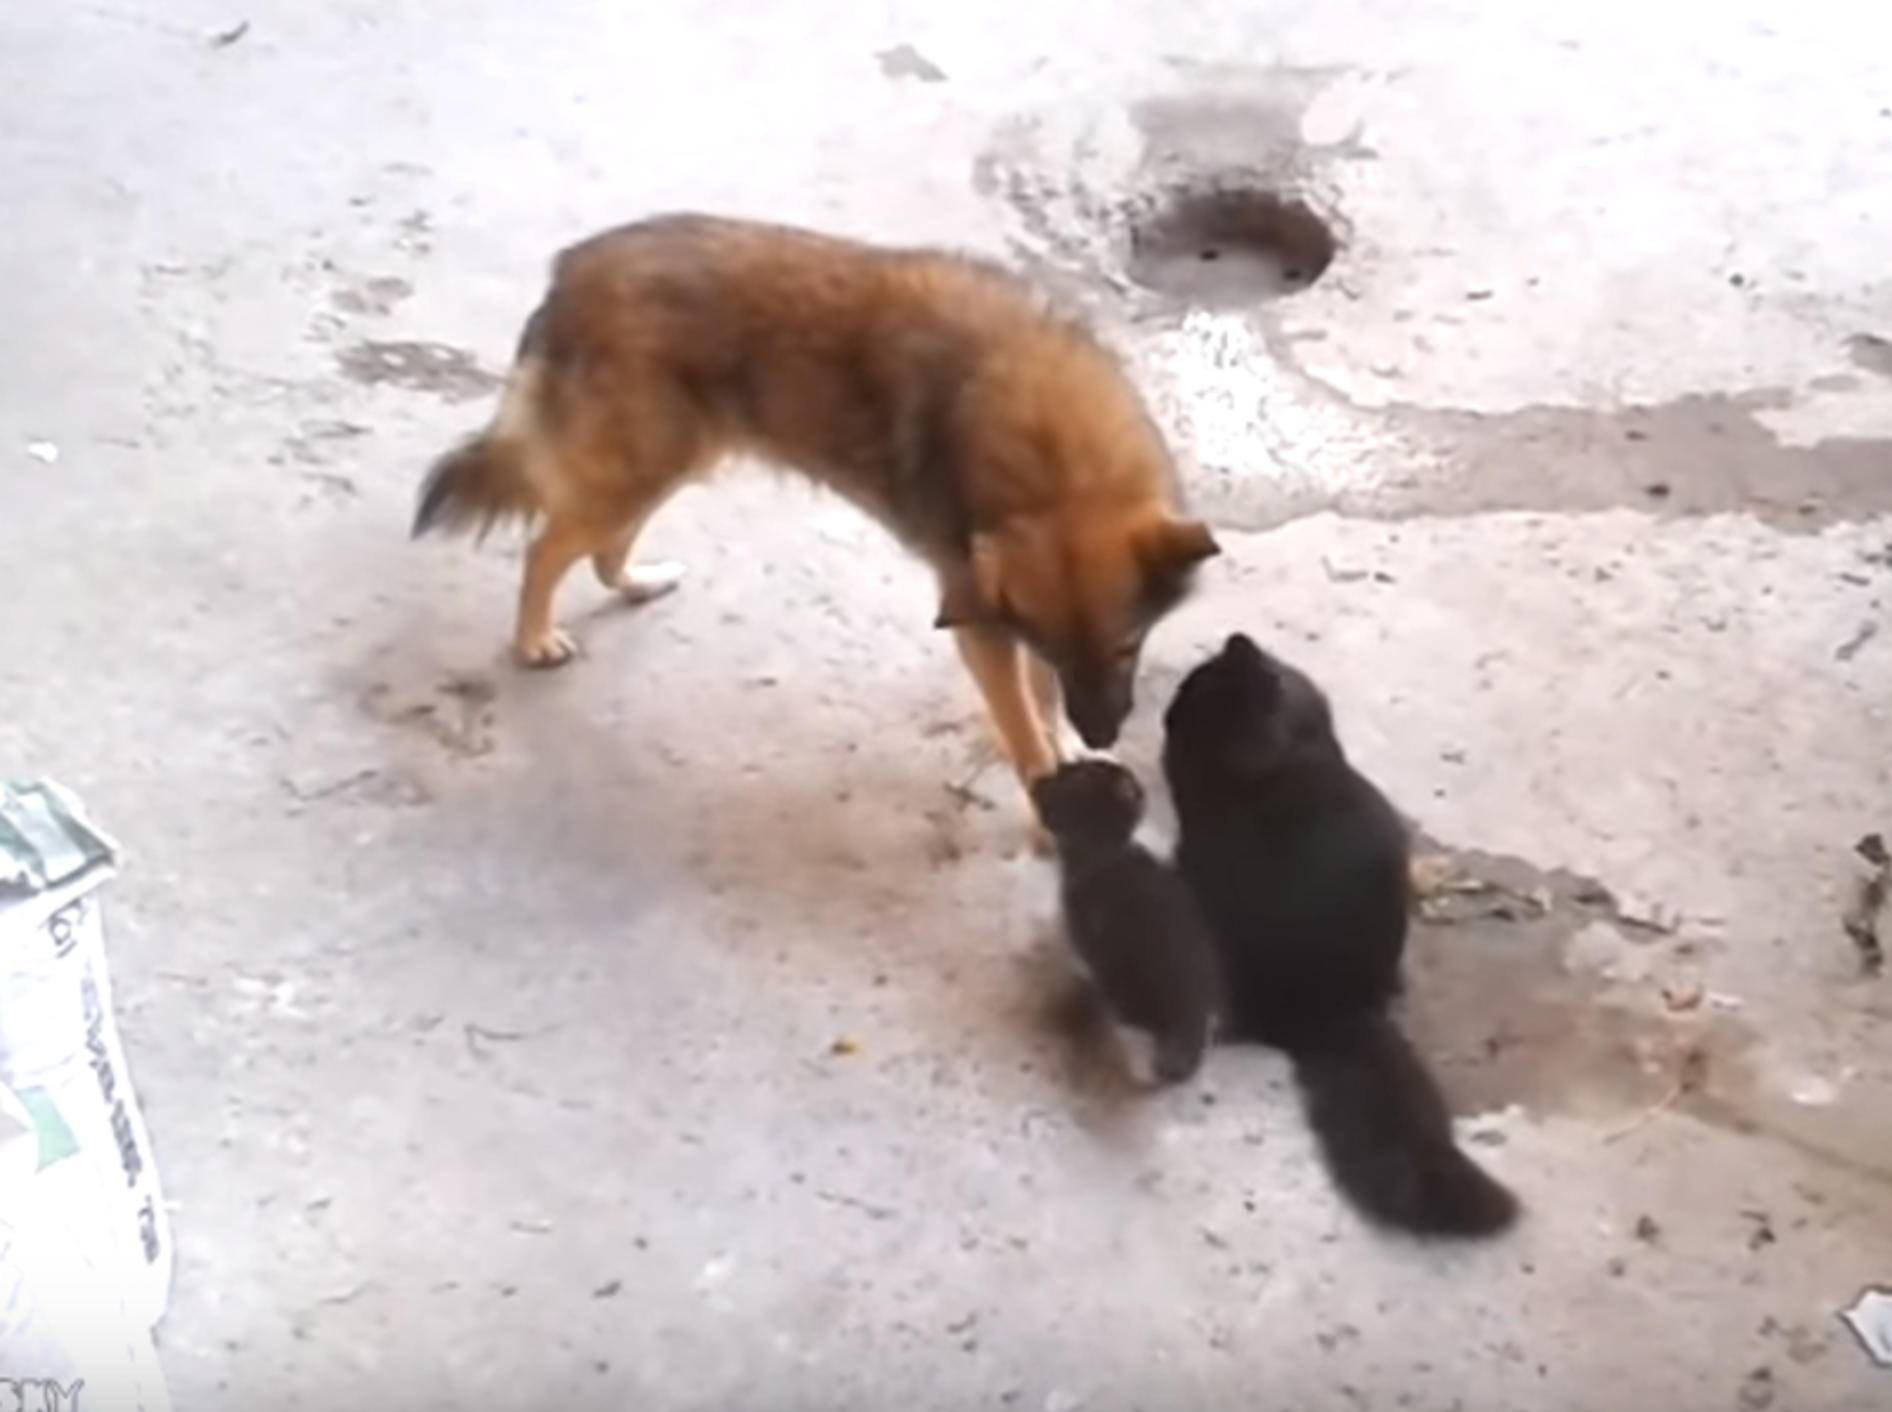 Katzenmama stellt ihren Babys Hundekumpel vor – Bild: YouTube / ignoramusky